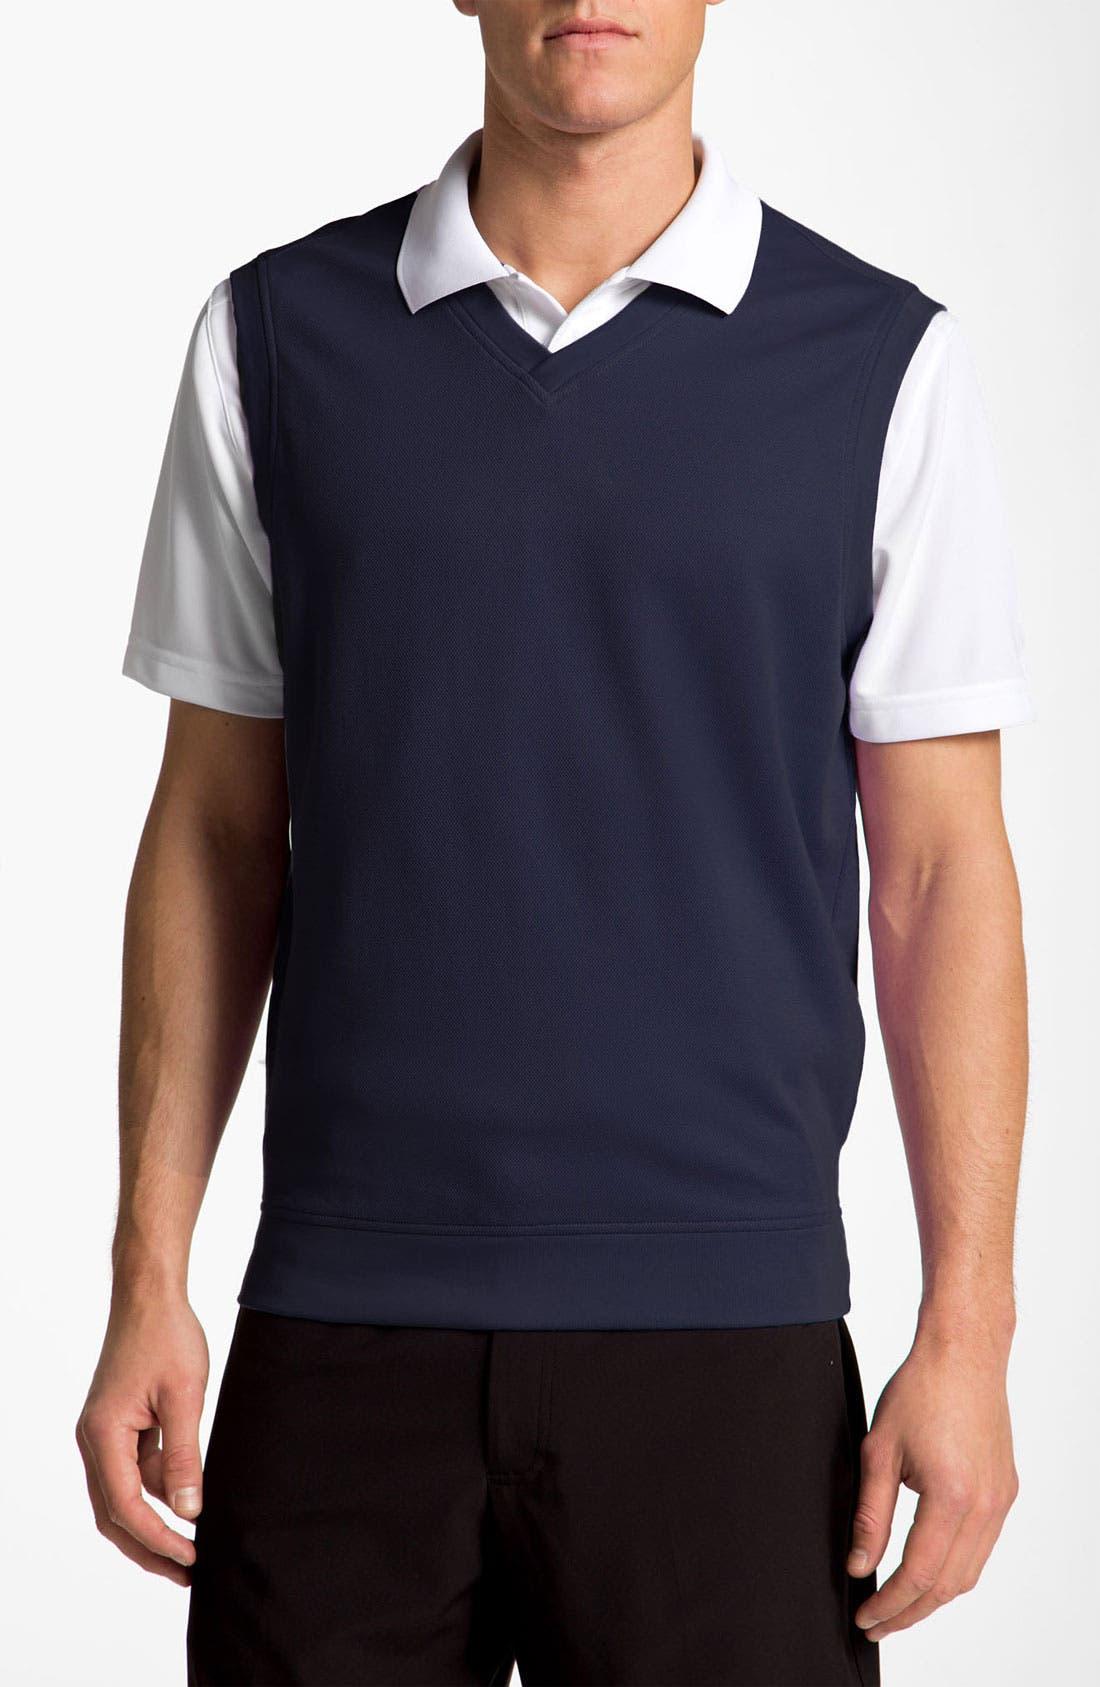 Alternate Image 1 Selected - Bobby Jones Piqué Sweater Vest